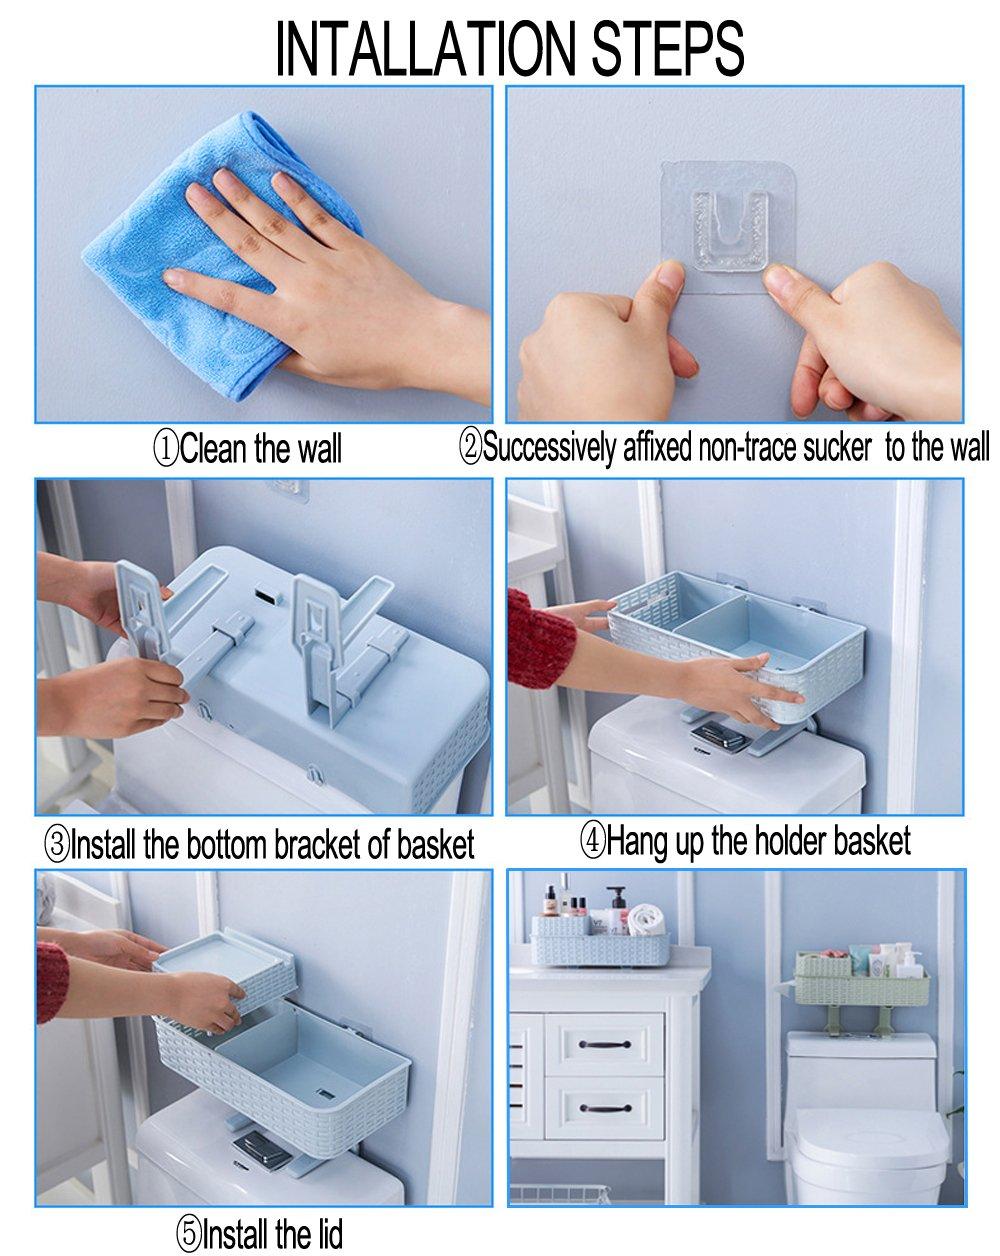 Acstar Multi-functional Suction Wall Toilet Rack Bathroom Hanging Storage Rack Kitchen Storage Basket Desktop Storage Basket Exempt from Punching Waterproof (Light blue) by Acstar (Image #8)